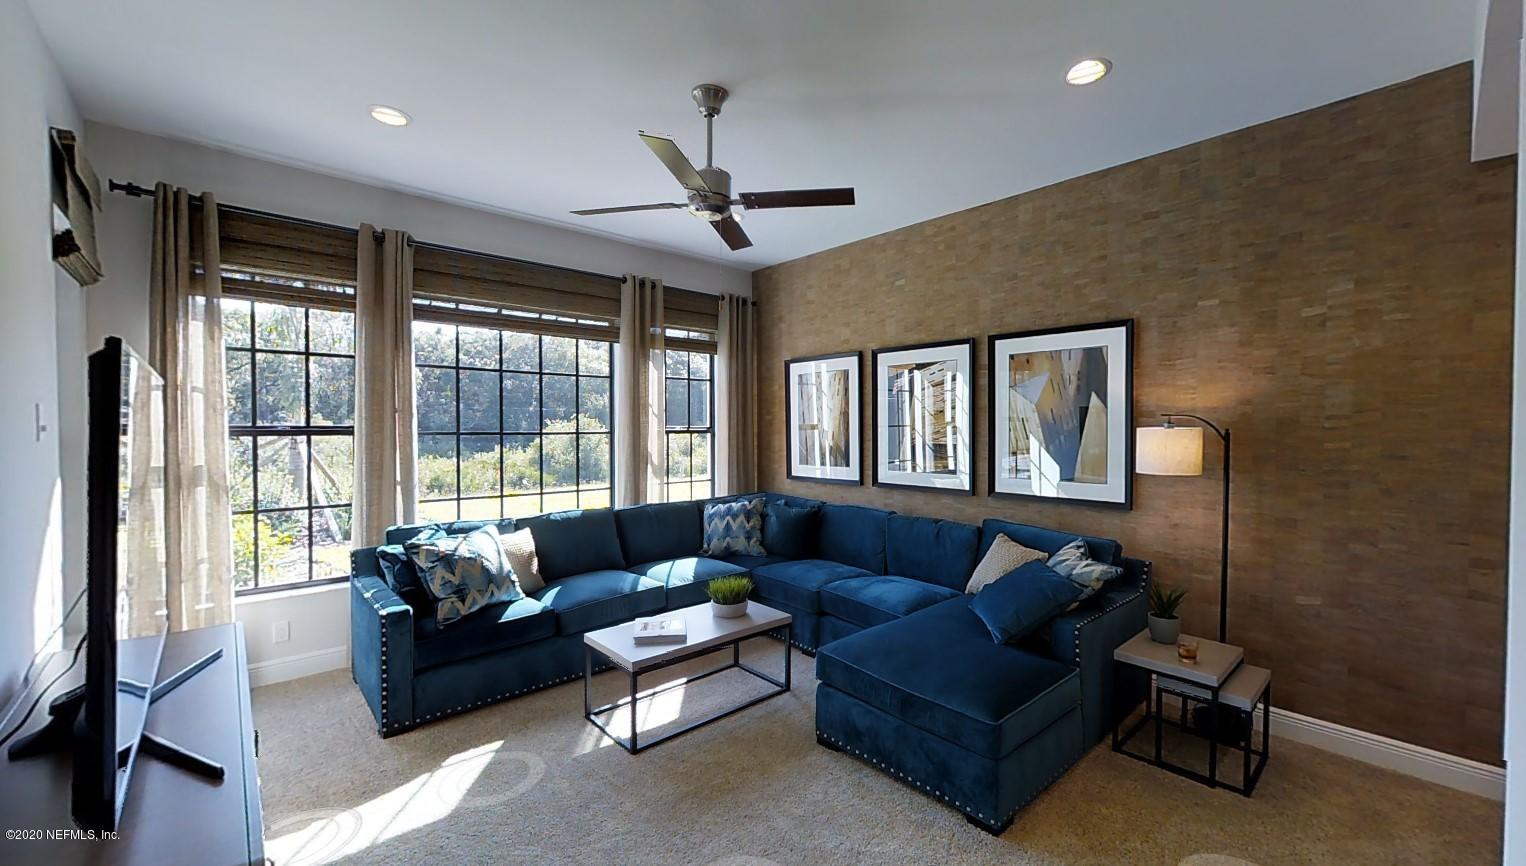 29 QUADRILLE, PONTE VEDRA BEACH, FLORIDA 32082, 3 Bedrooms Bedrooms, ,3 BathroomsBathrooms,Residential,For sale,QUADRILLE,1032634